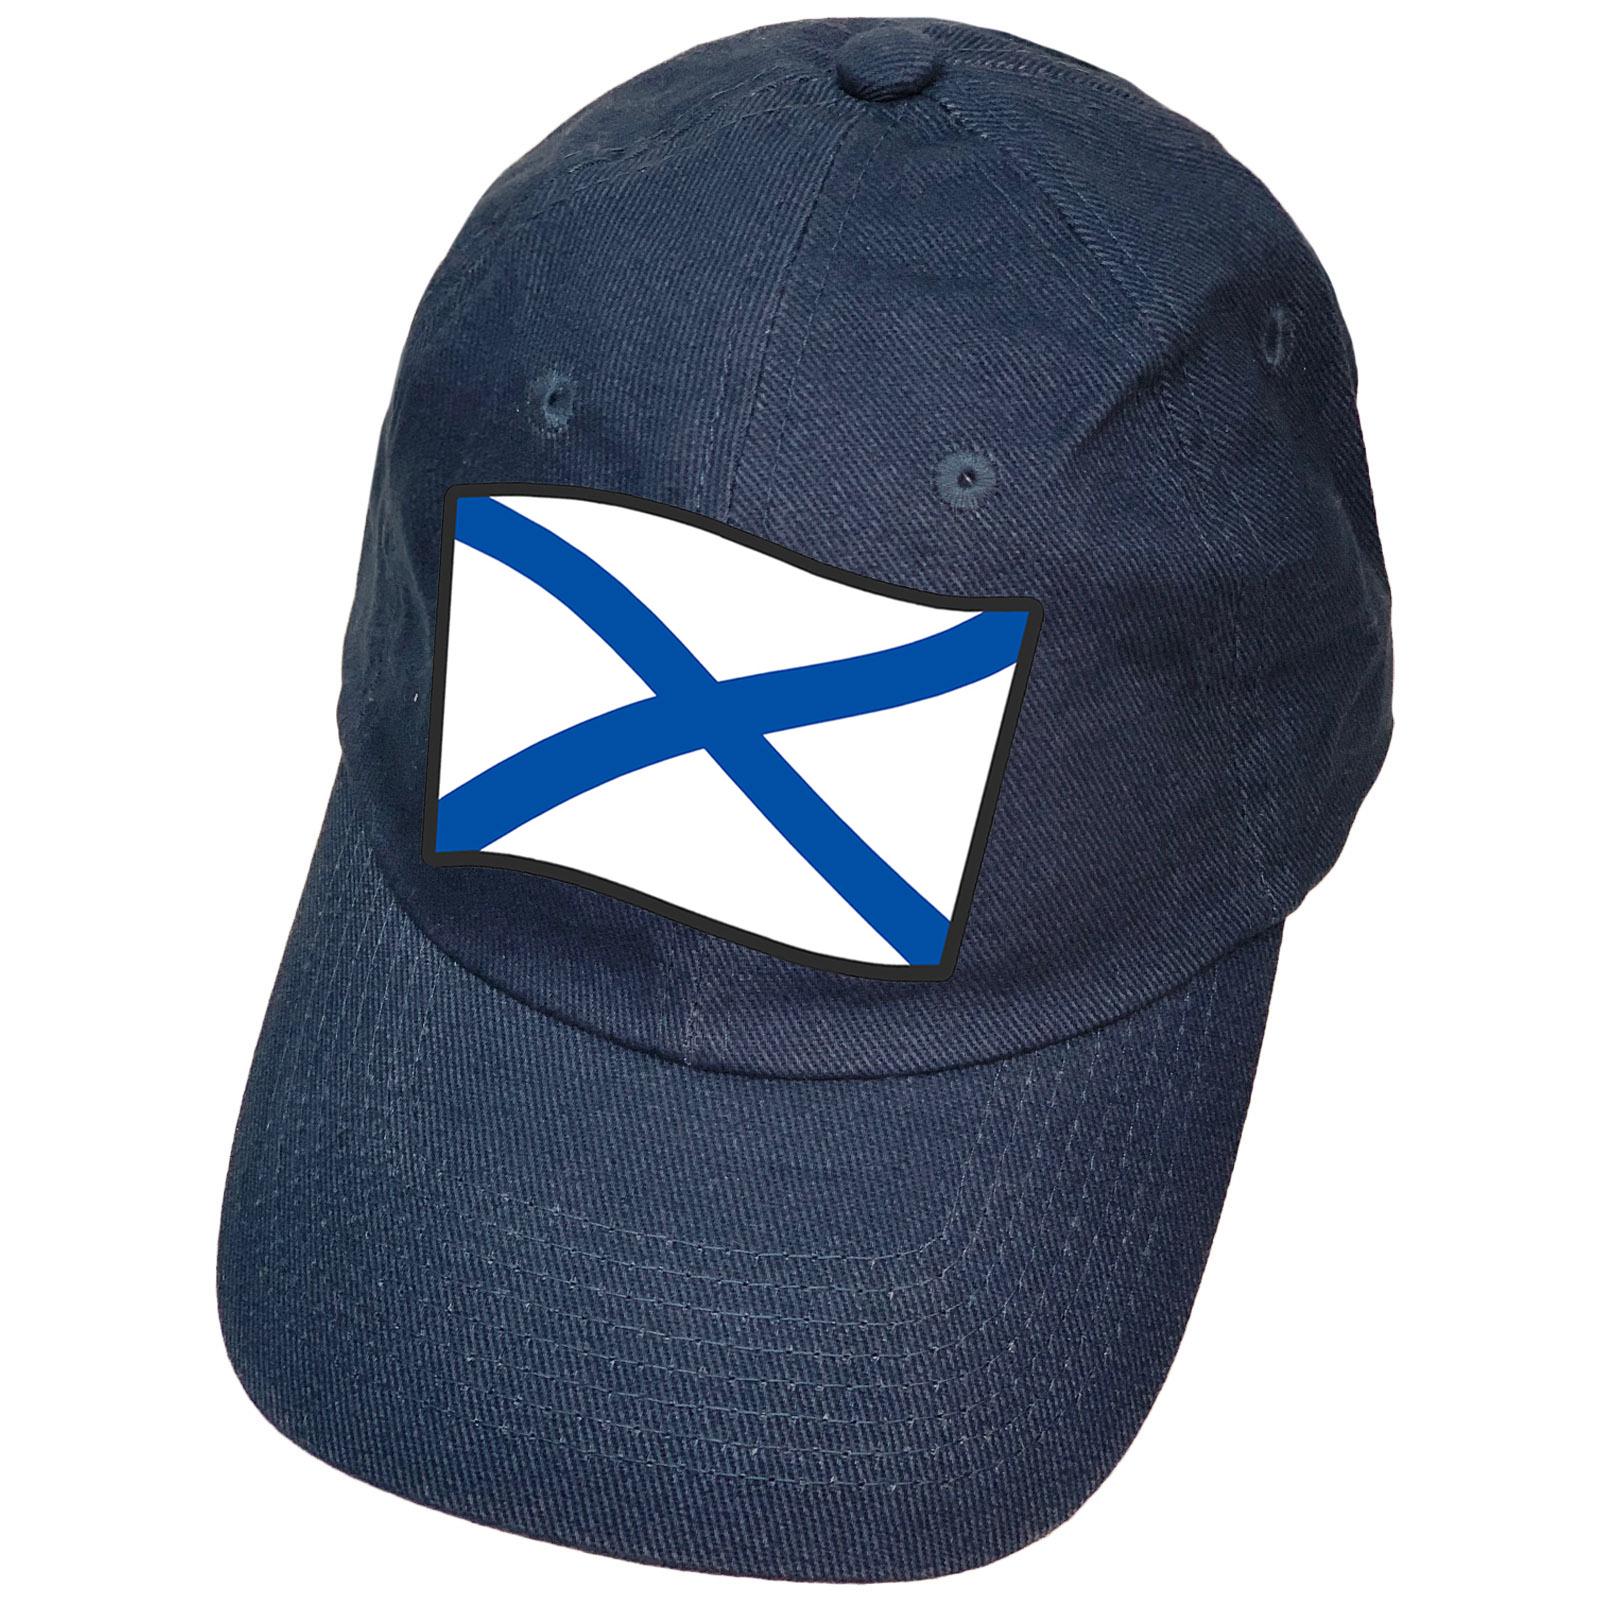 Синяя кепка с Андреевским флагом